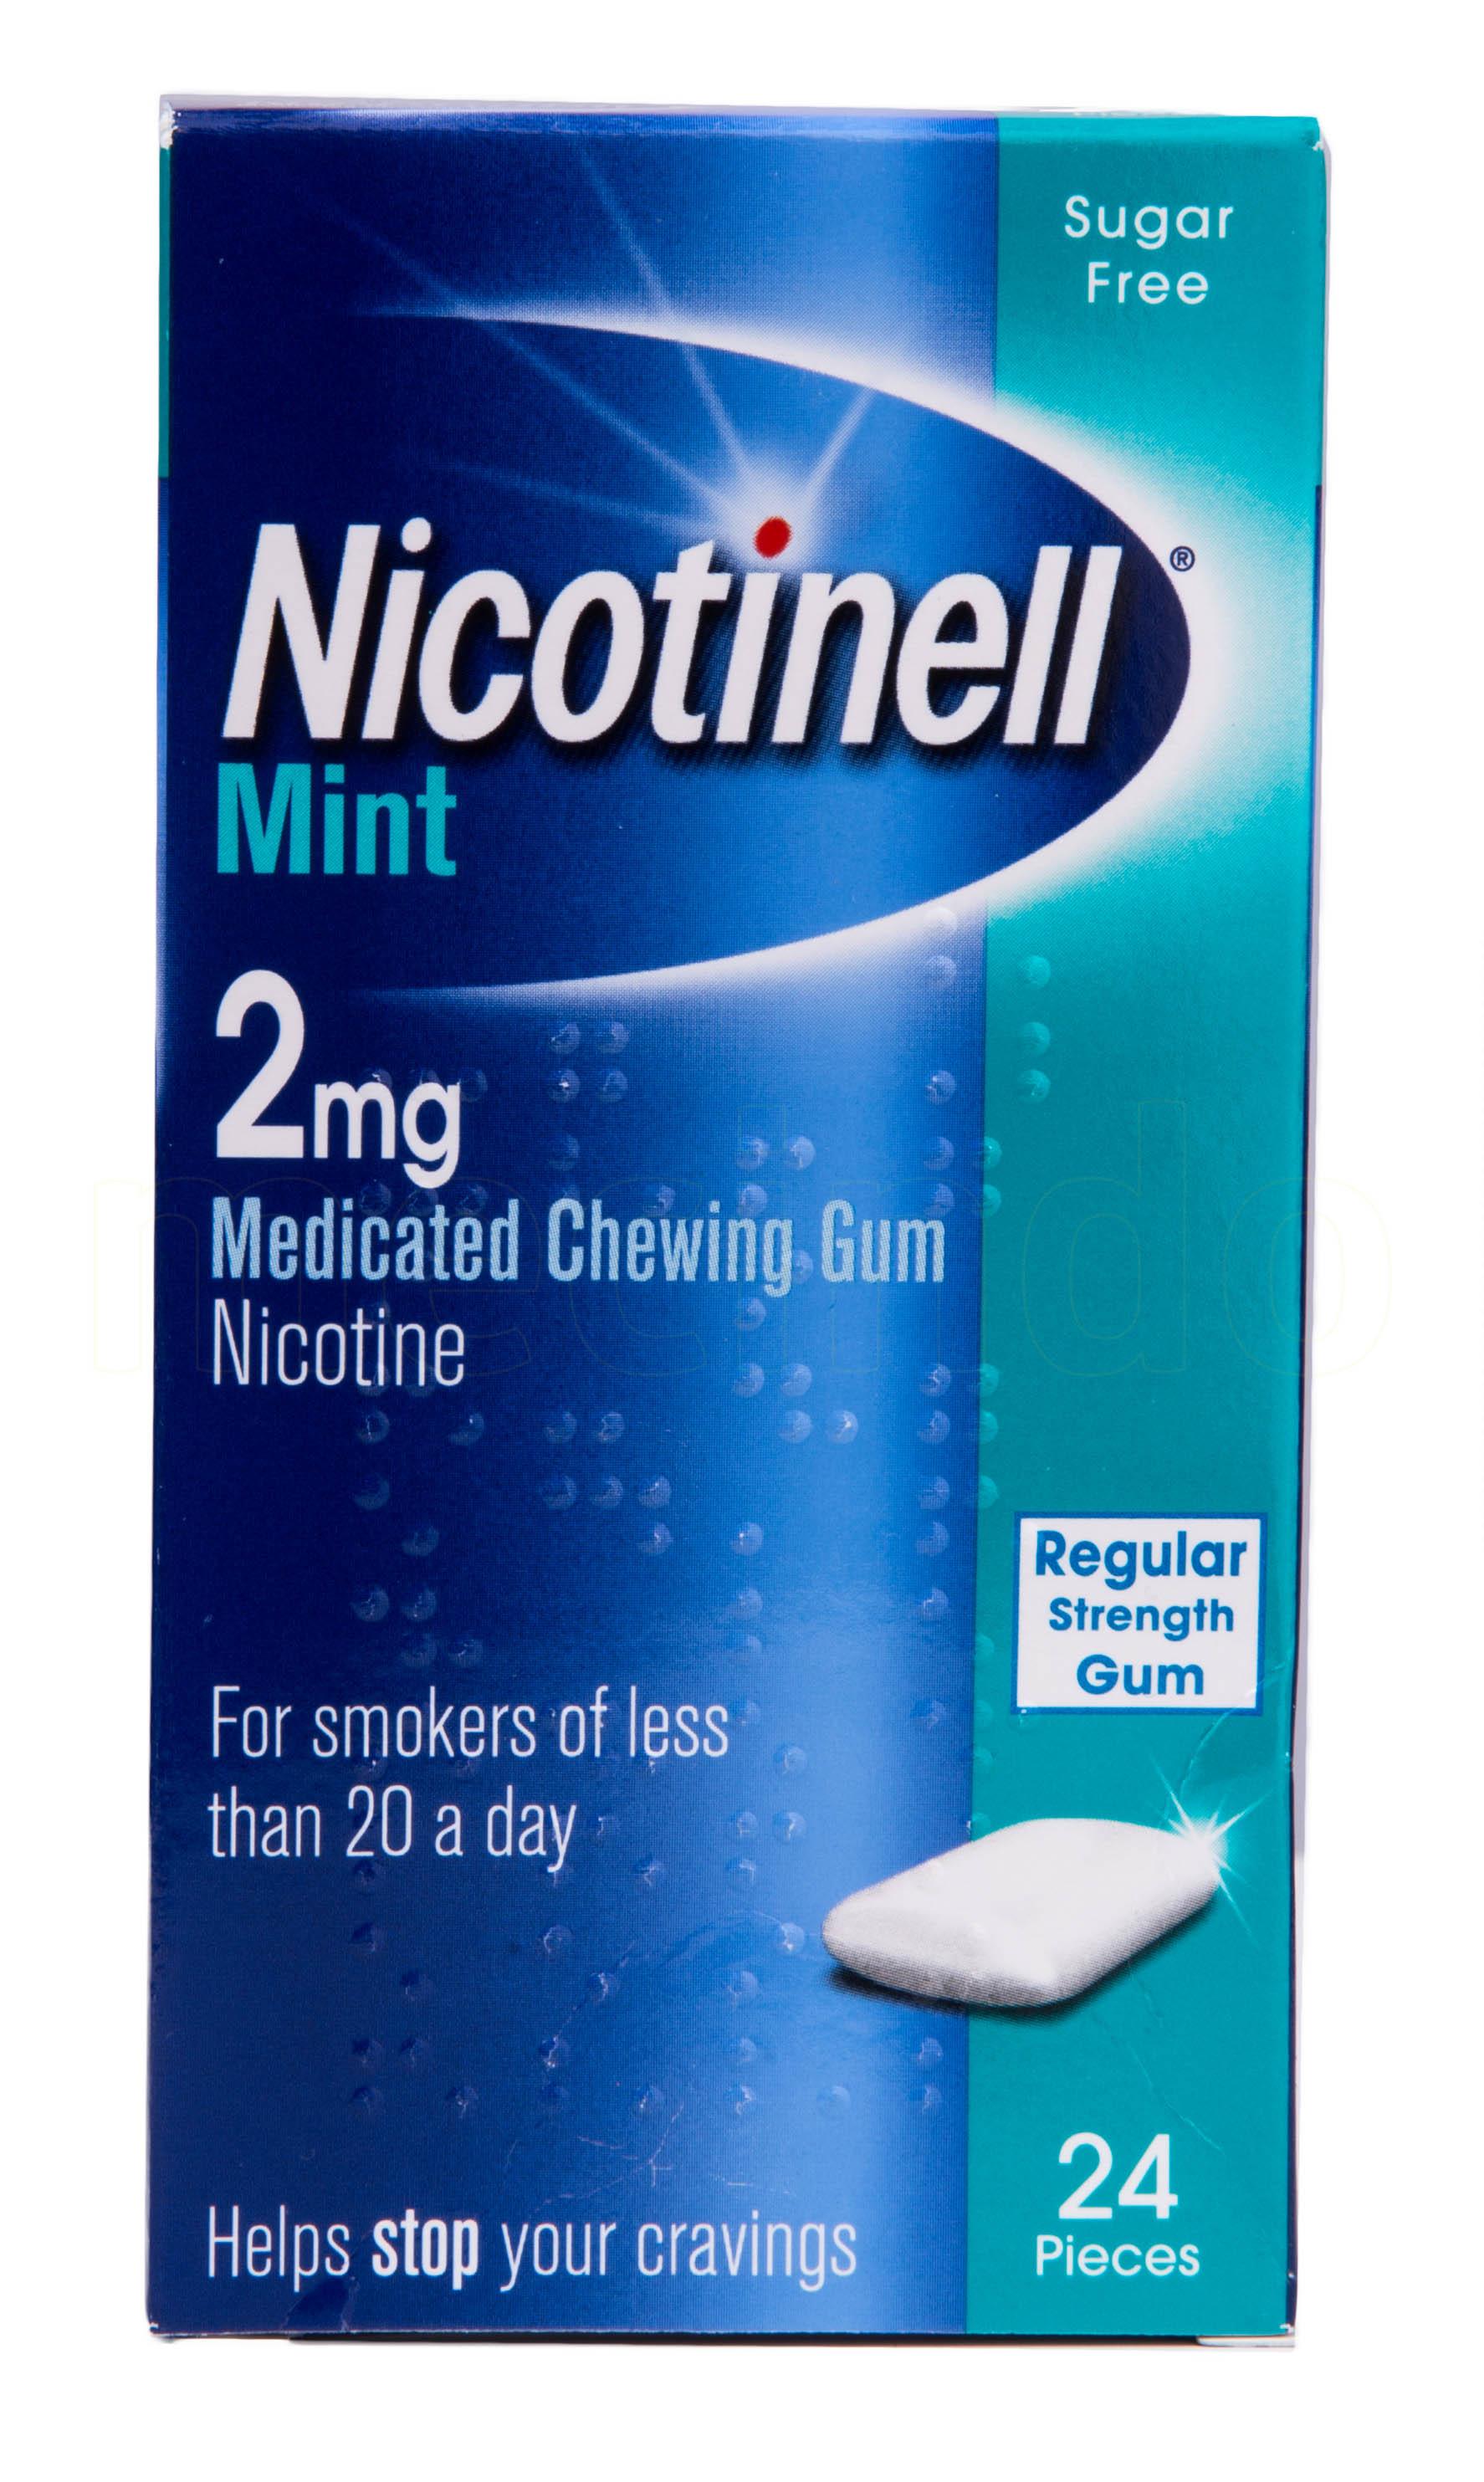 Billede af Nicotinell Tyggegummi Mint - 2 mg - 24 stk